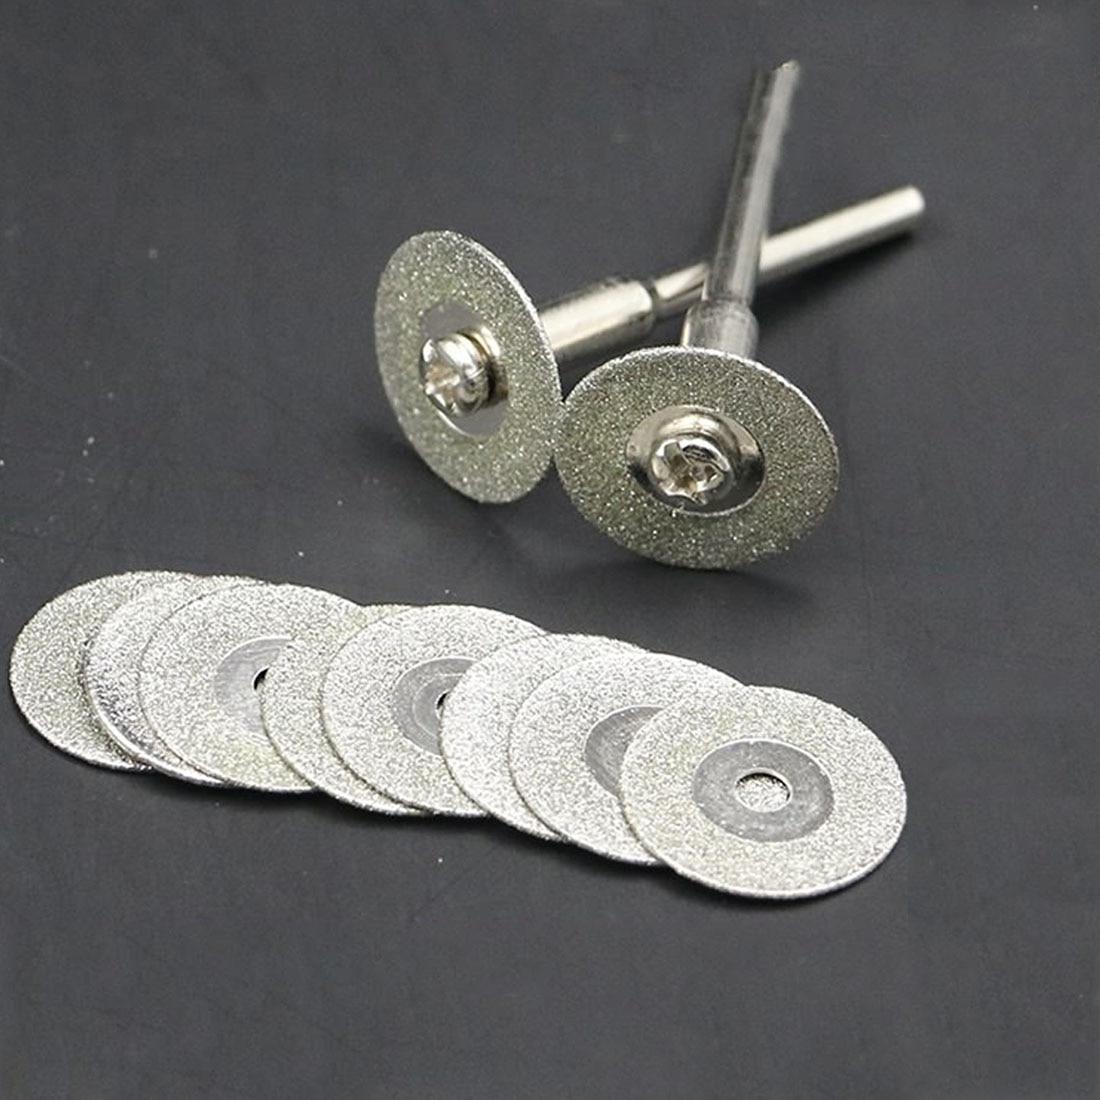 60mm Diamond Cutting Disc For Mini Drill Dremel Tools Diamond Disc Steel Rotary Tool Circular Saw Abrasive Saw Blade